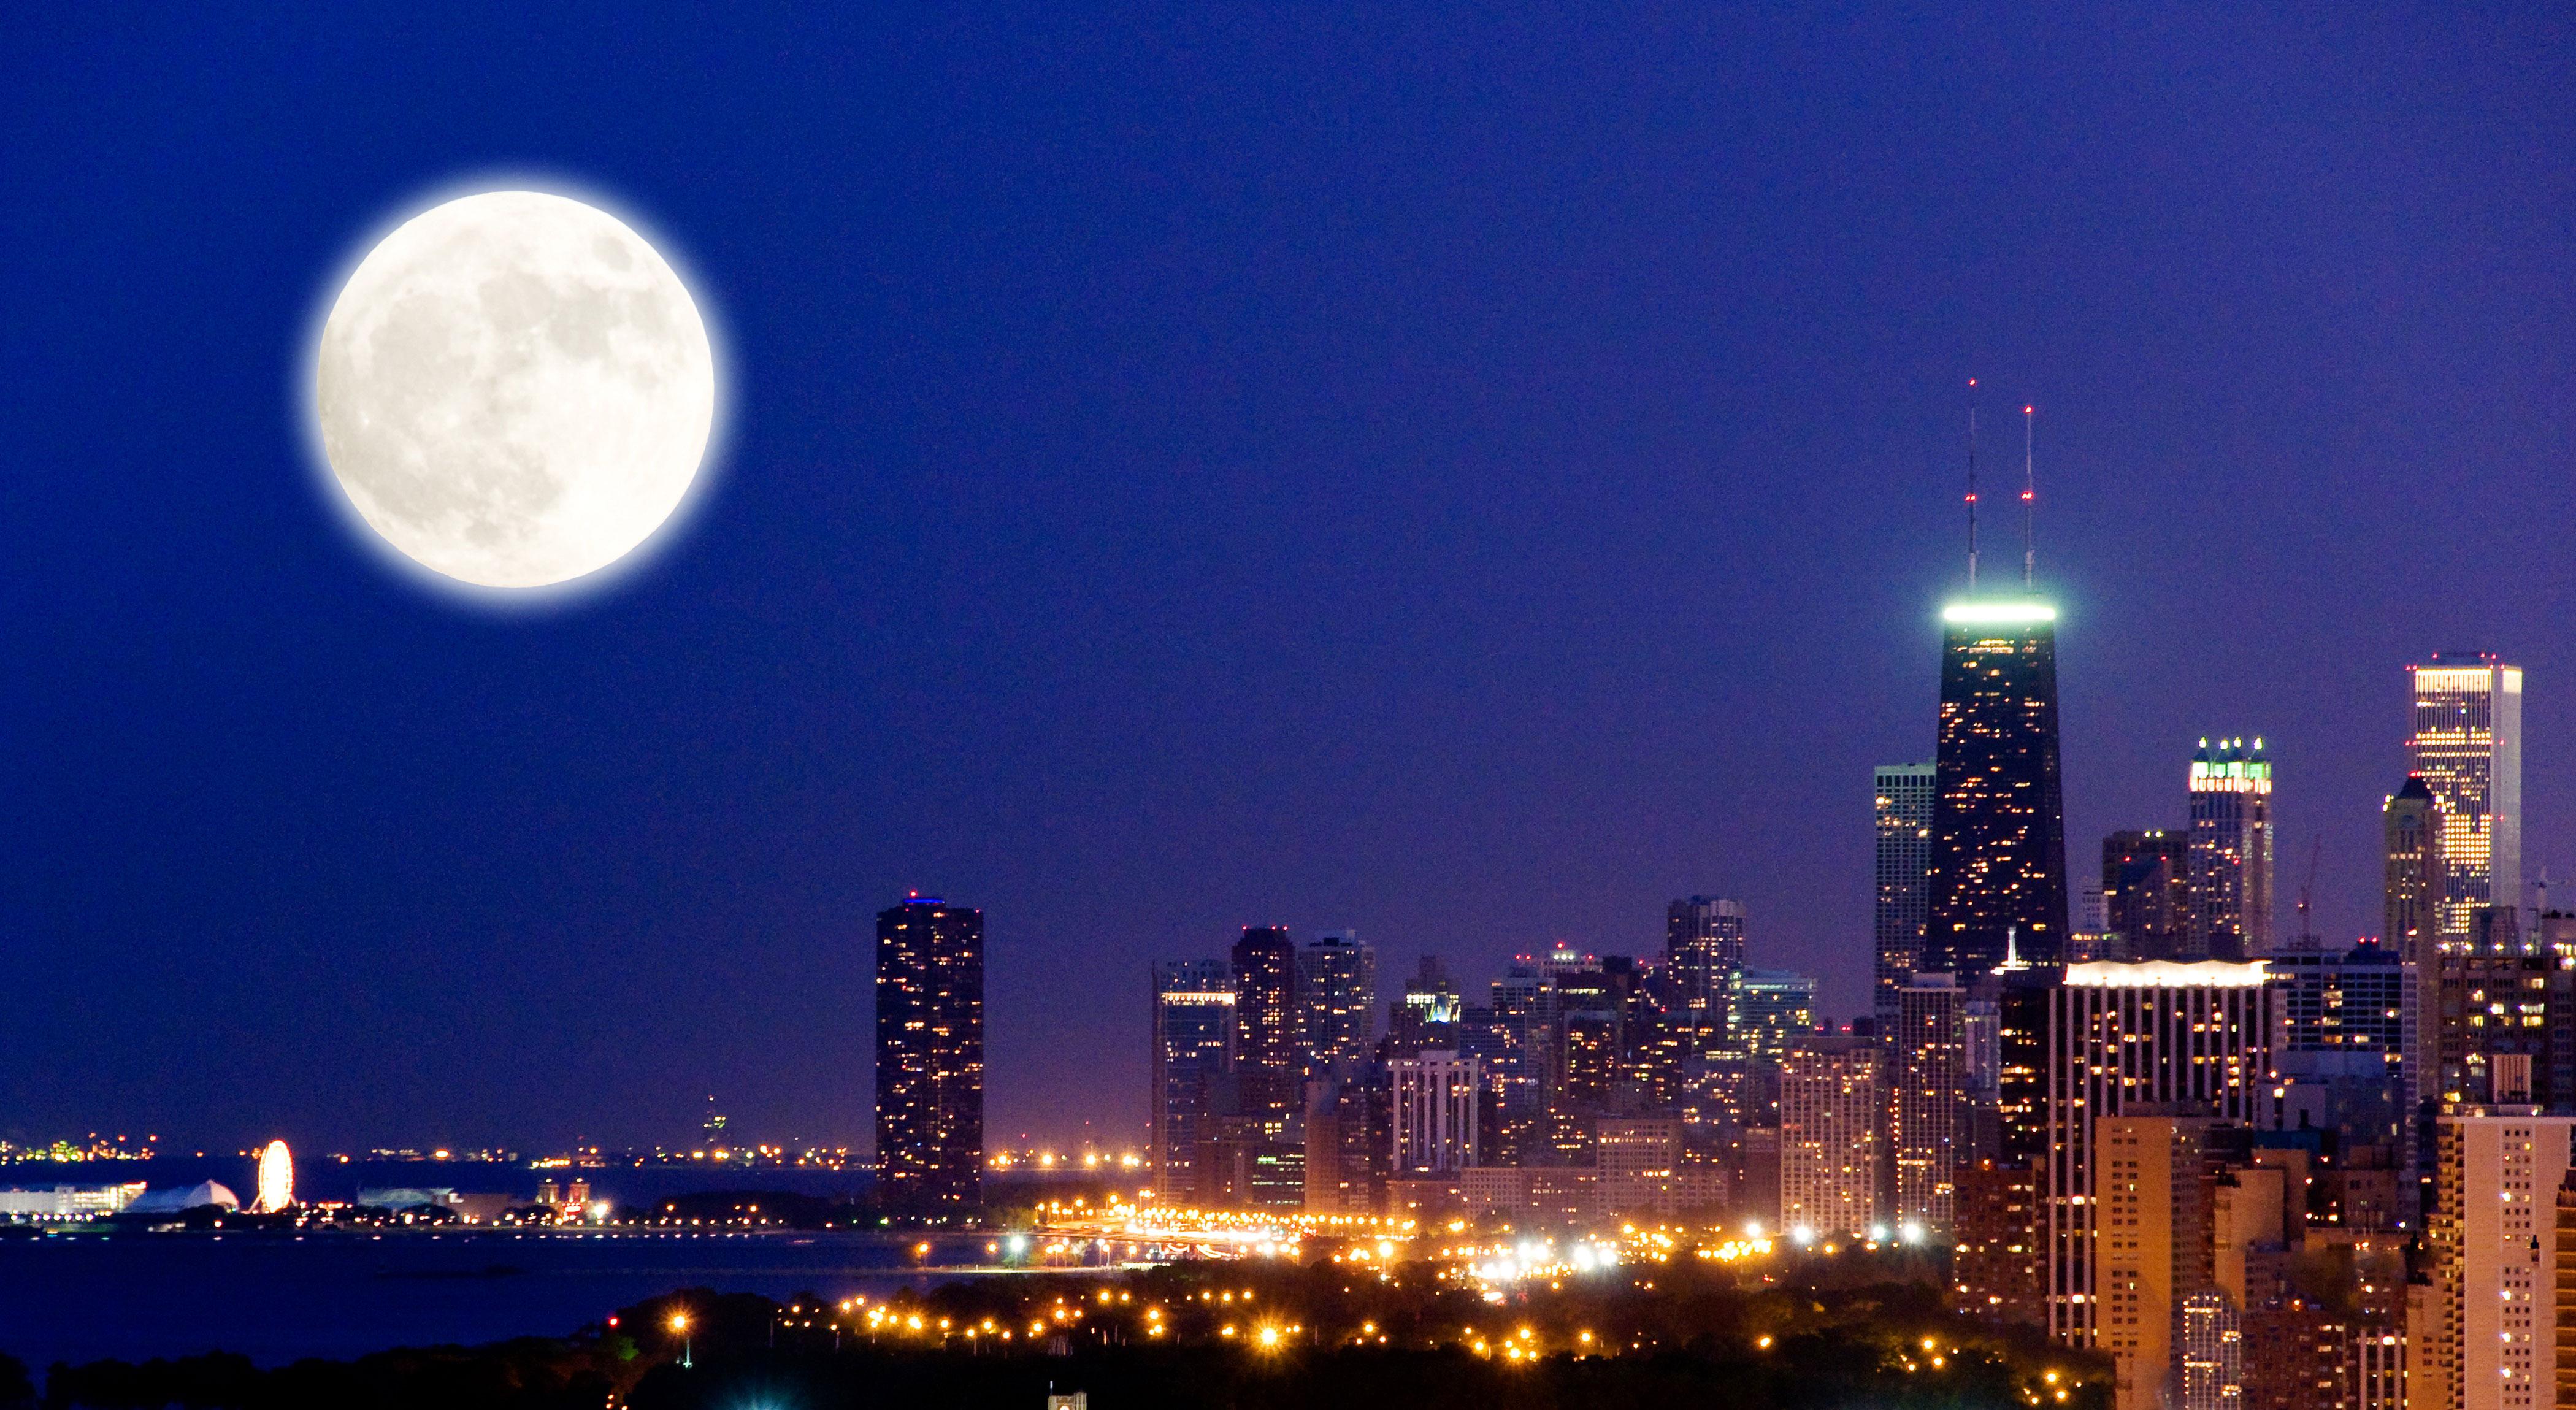 my history-Chicago skyline at night